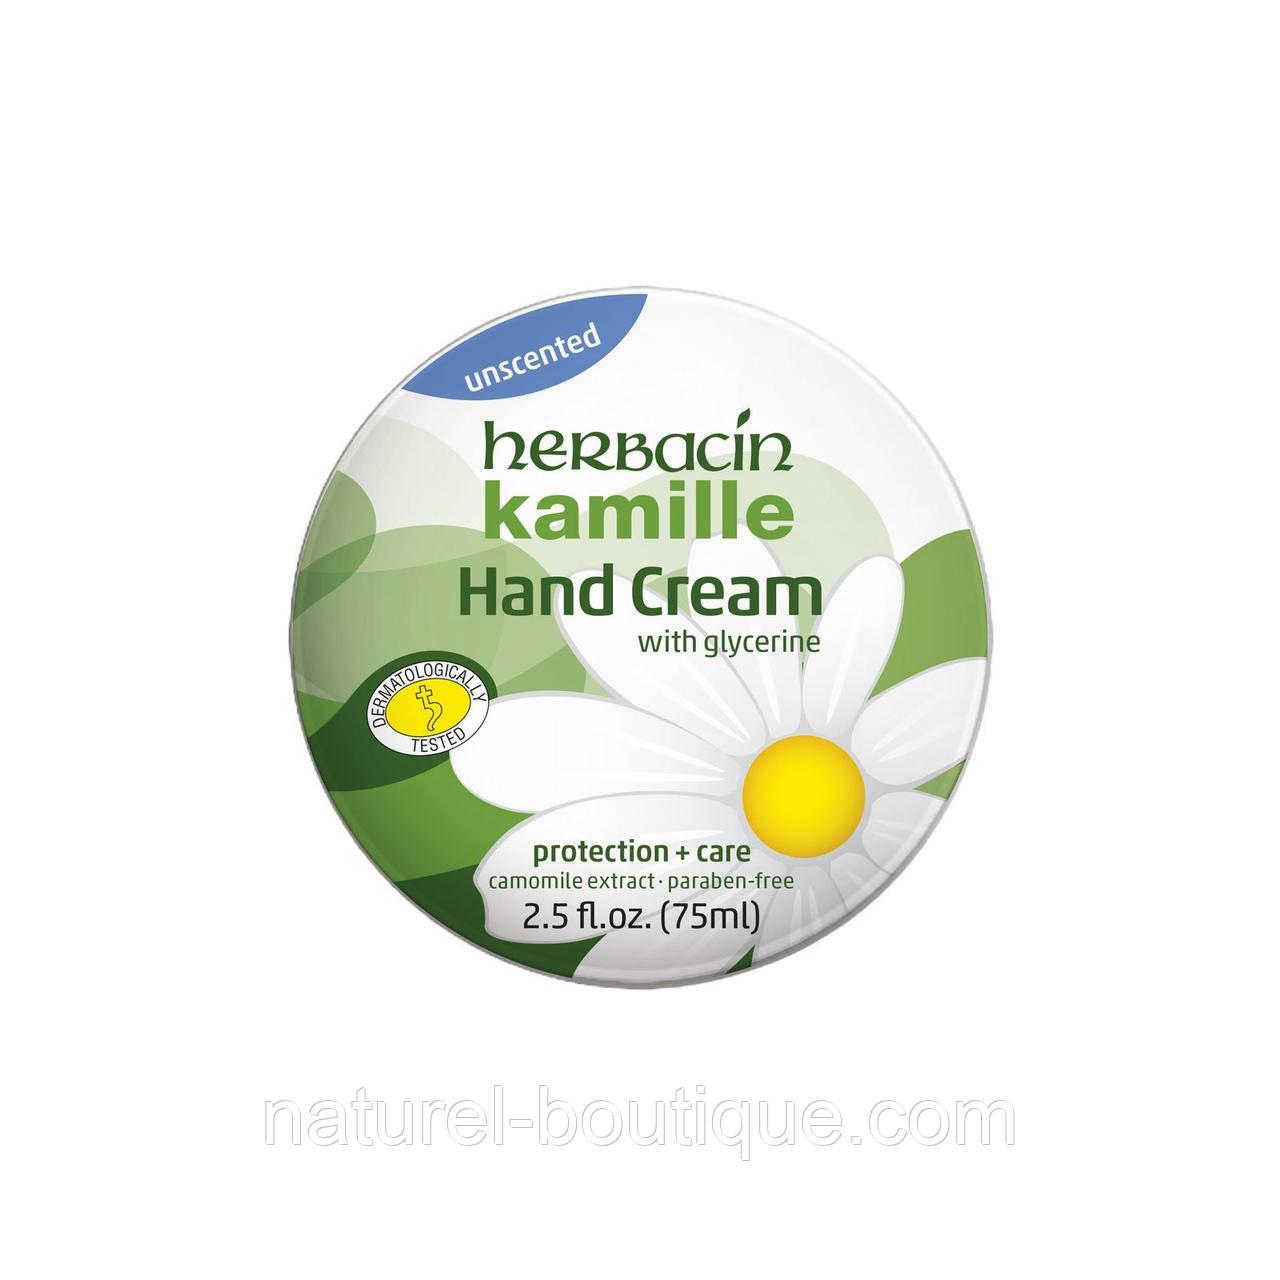 Крем для рук Herbacin kamille без запаха 75 мл